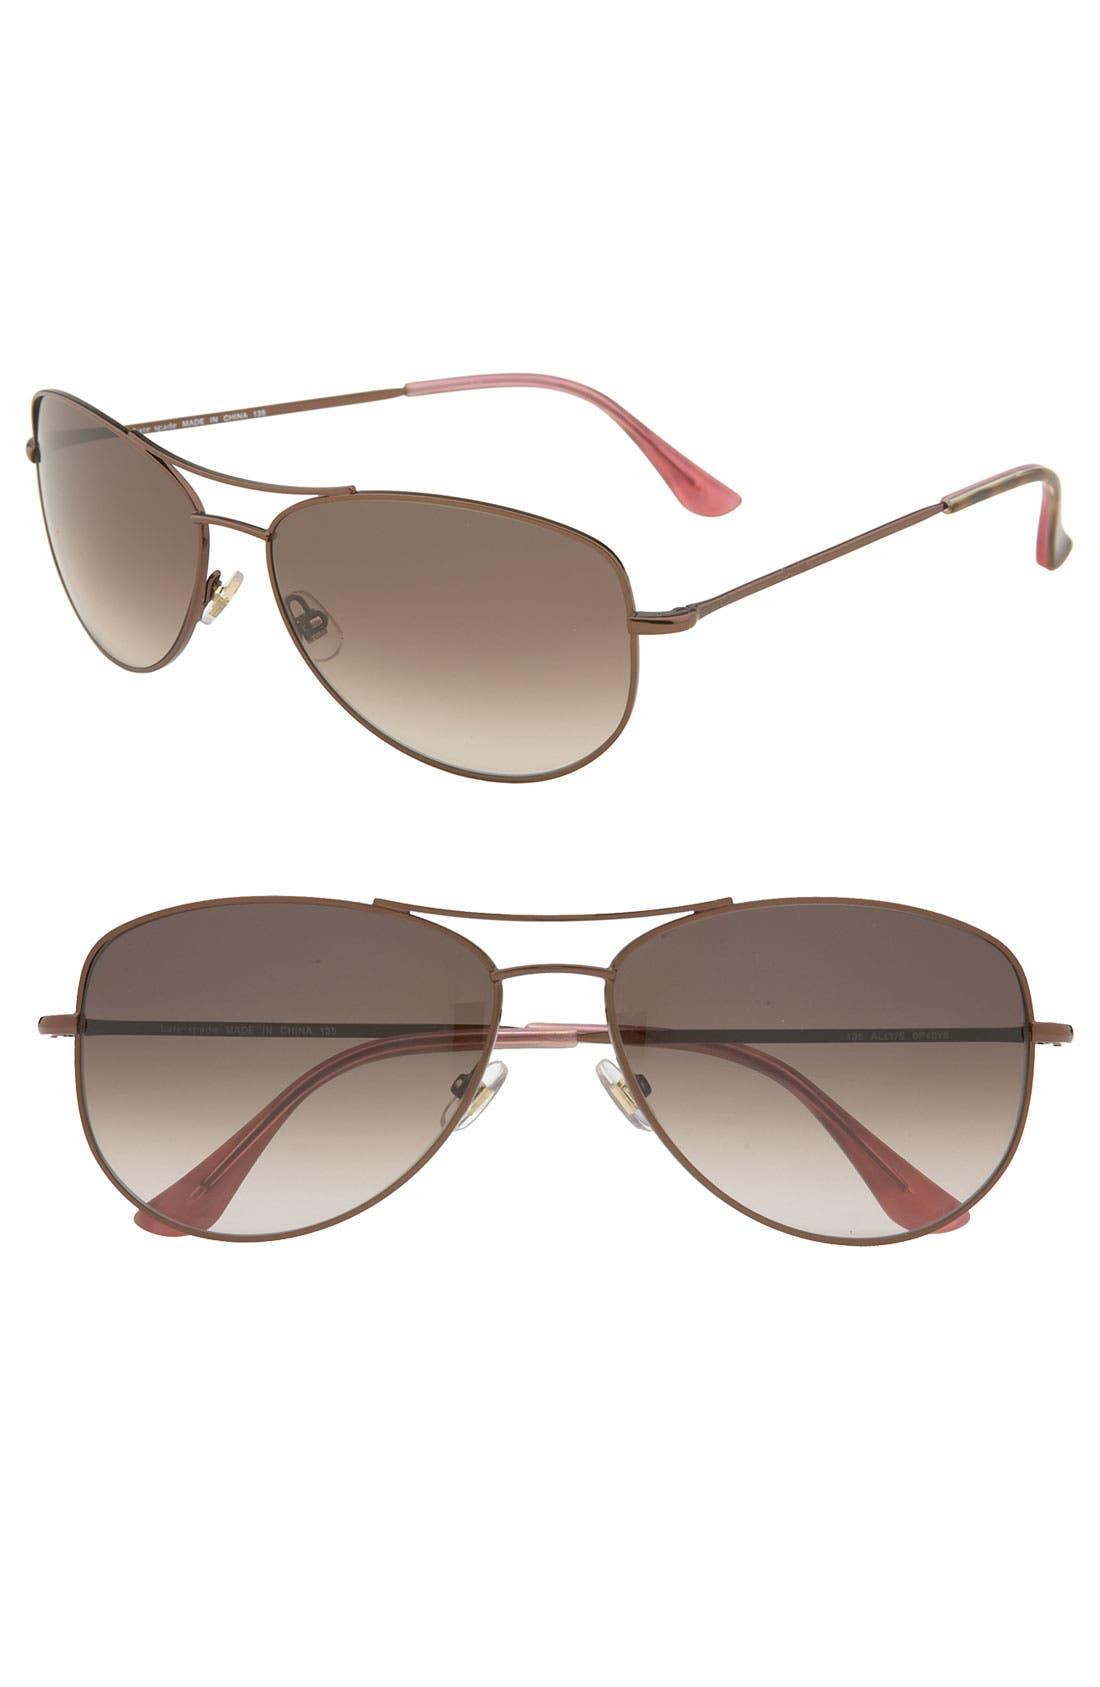 kate spade 'ally' metal aviator sunglasses,                             Main thumbnail 1, color,                             200